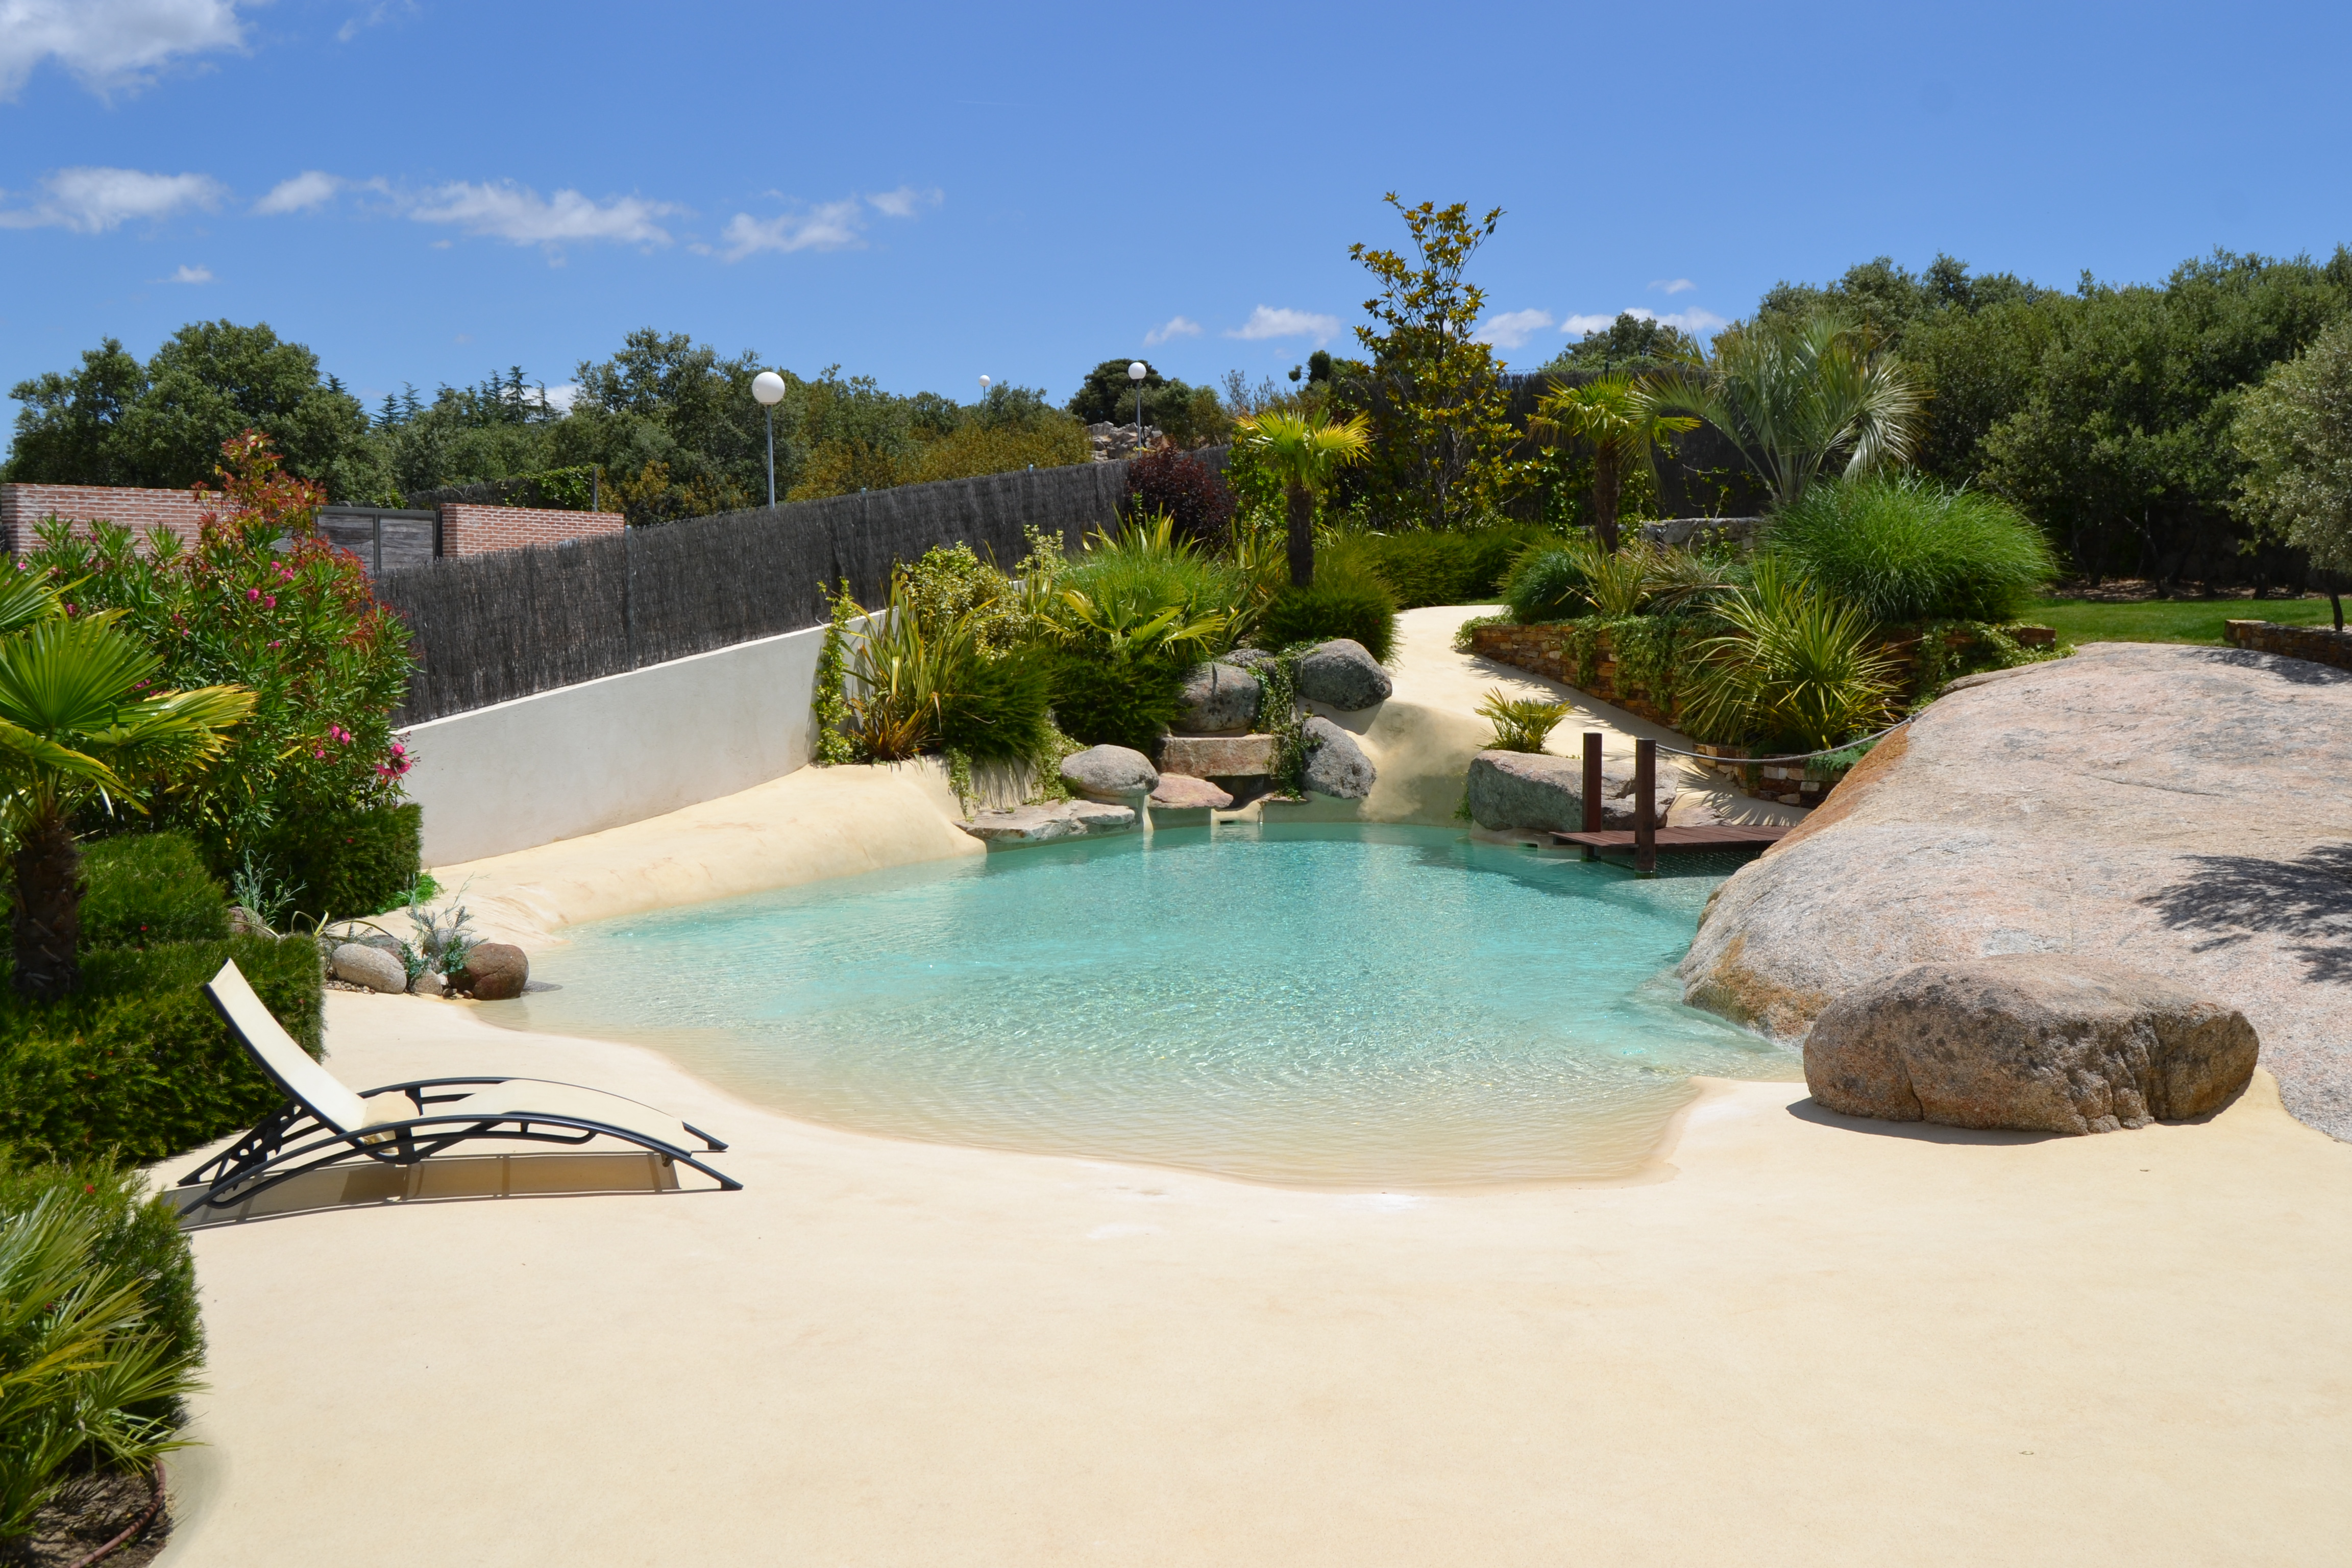 Piscinas de arena o c mo disfrutar de la playa sin salir for A forma di piani di casa con piscina